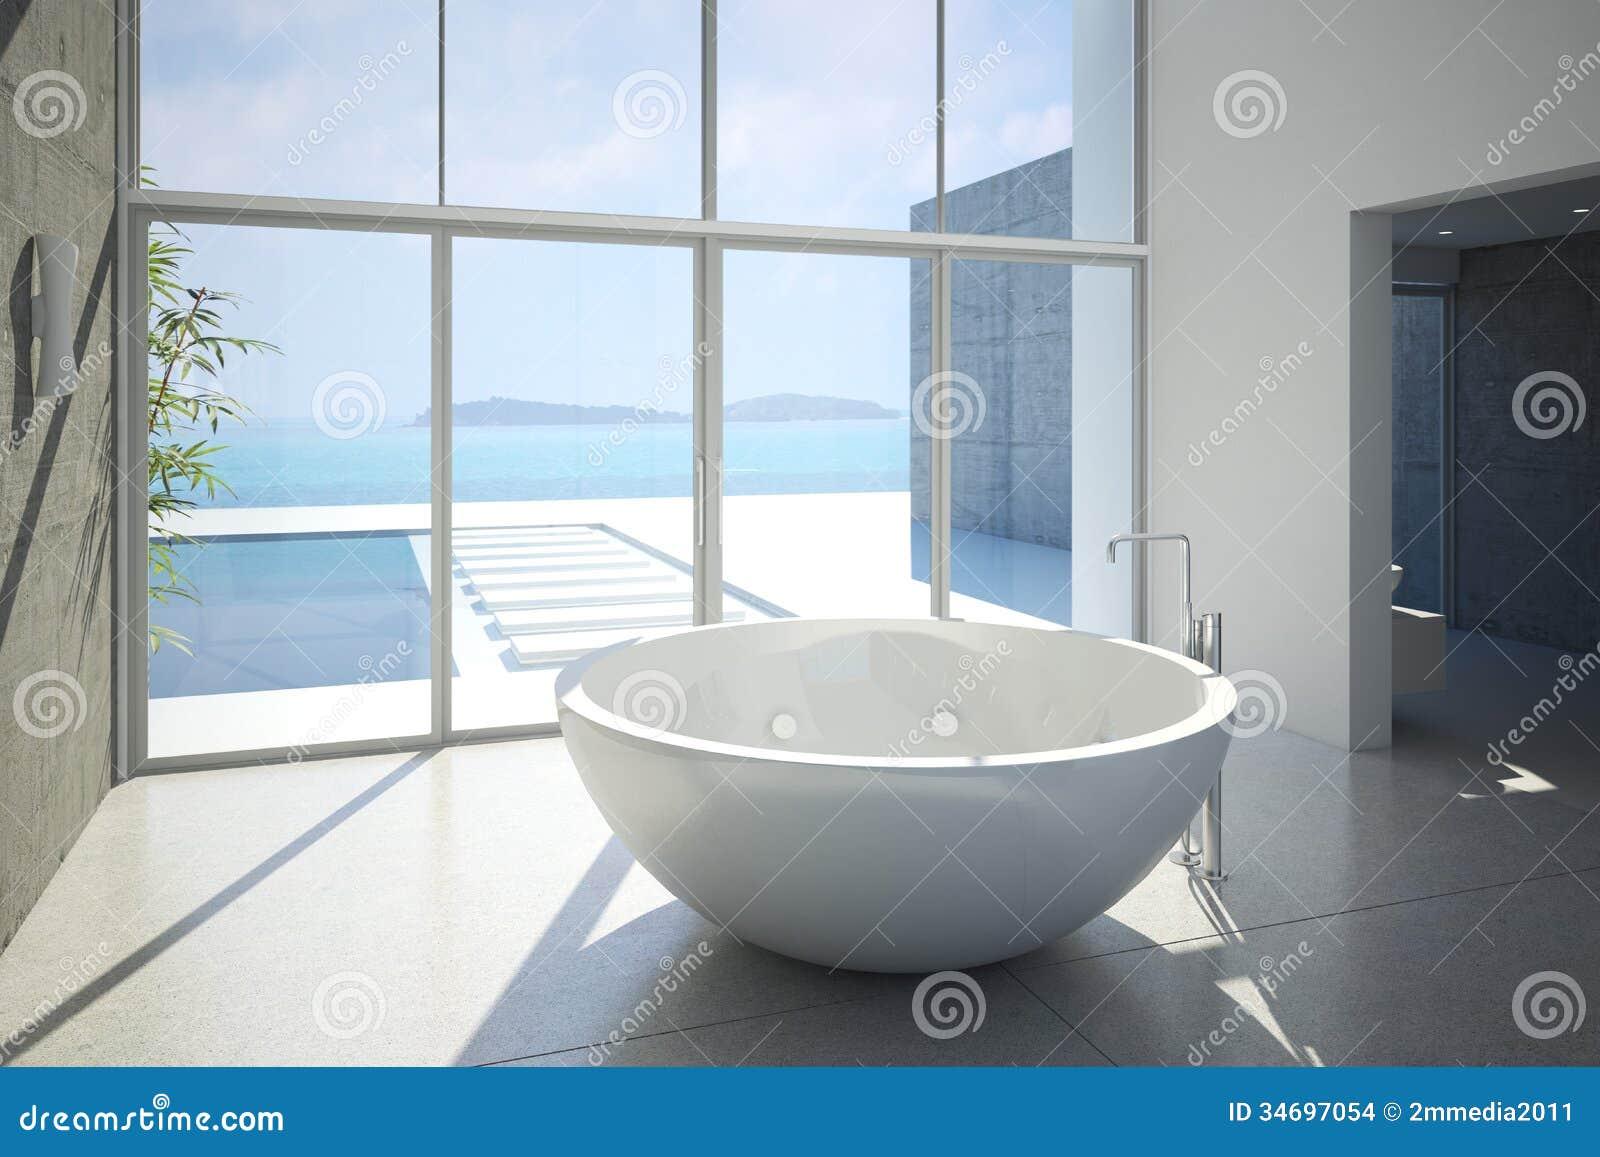 Bathtube stock illustration. Illustration of modern, interior - 34697054